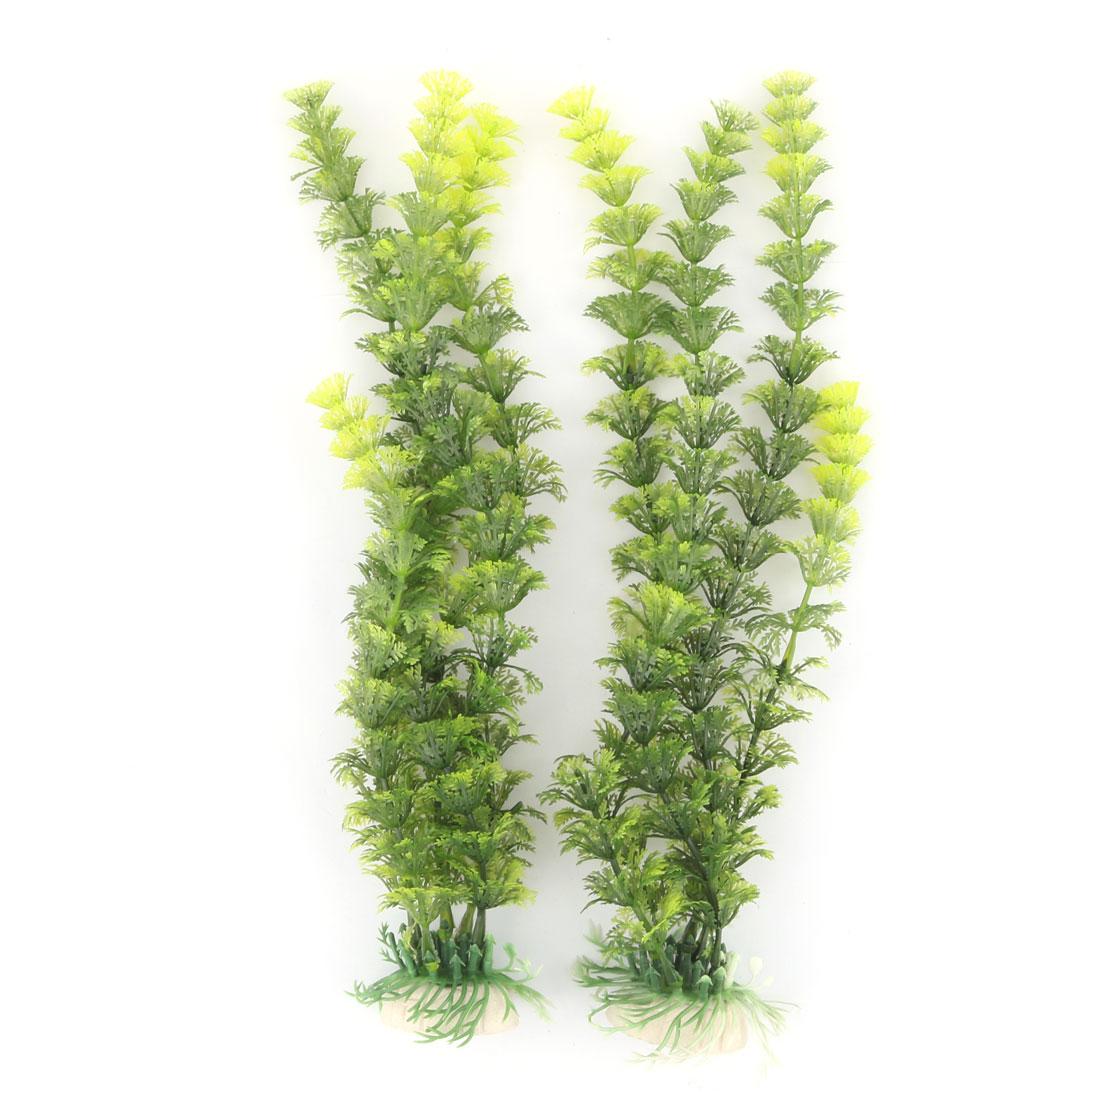 Aquarium Ceramic Base Plastic Artificial Underwater Water Grass Plant Ornament Green 2 Pcs